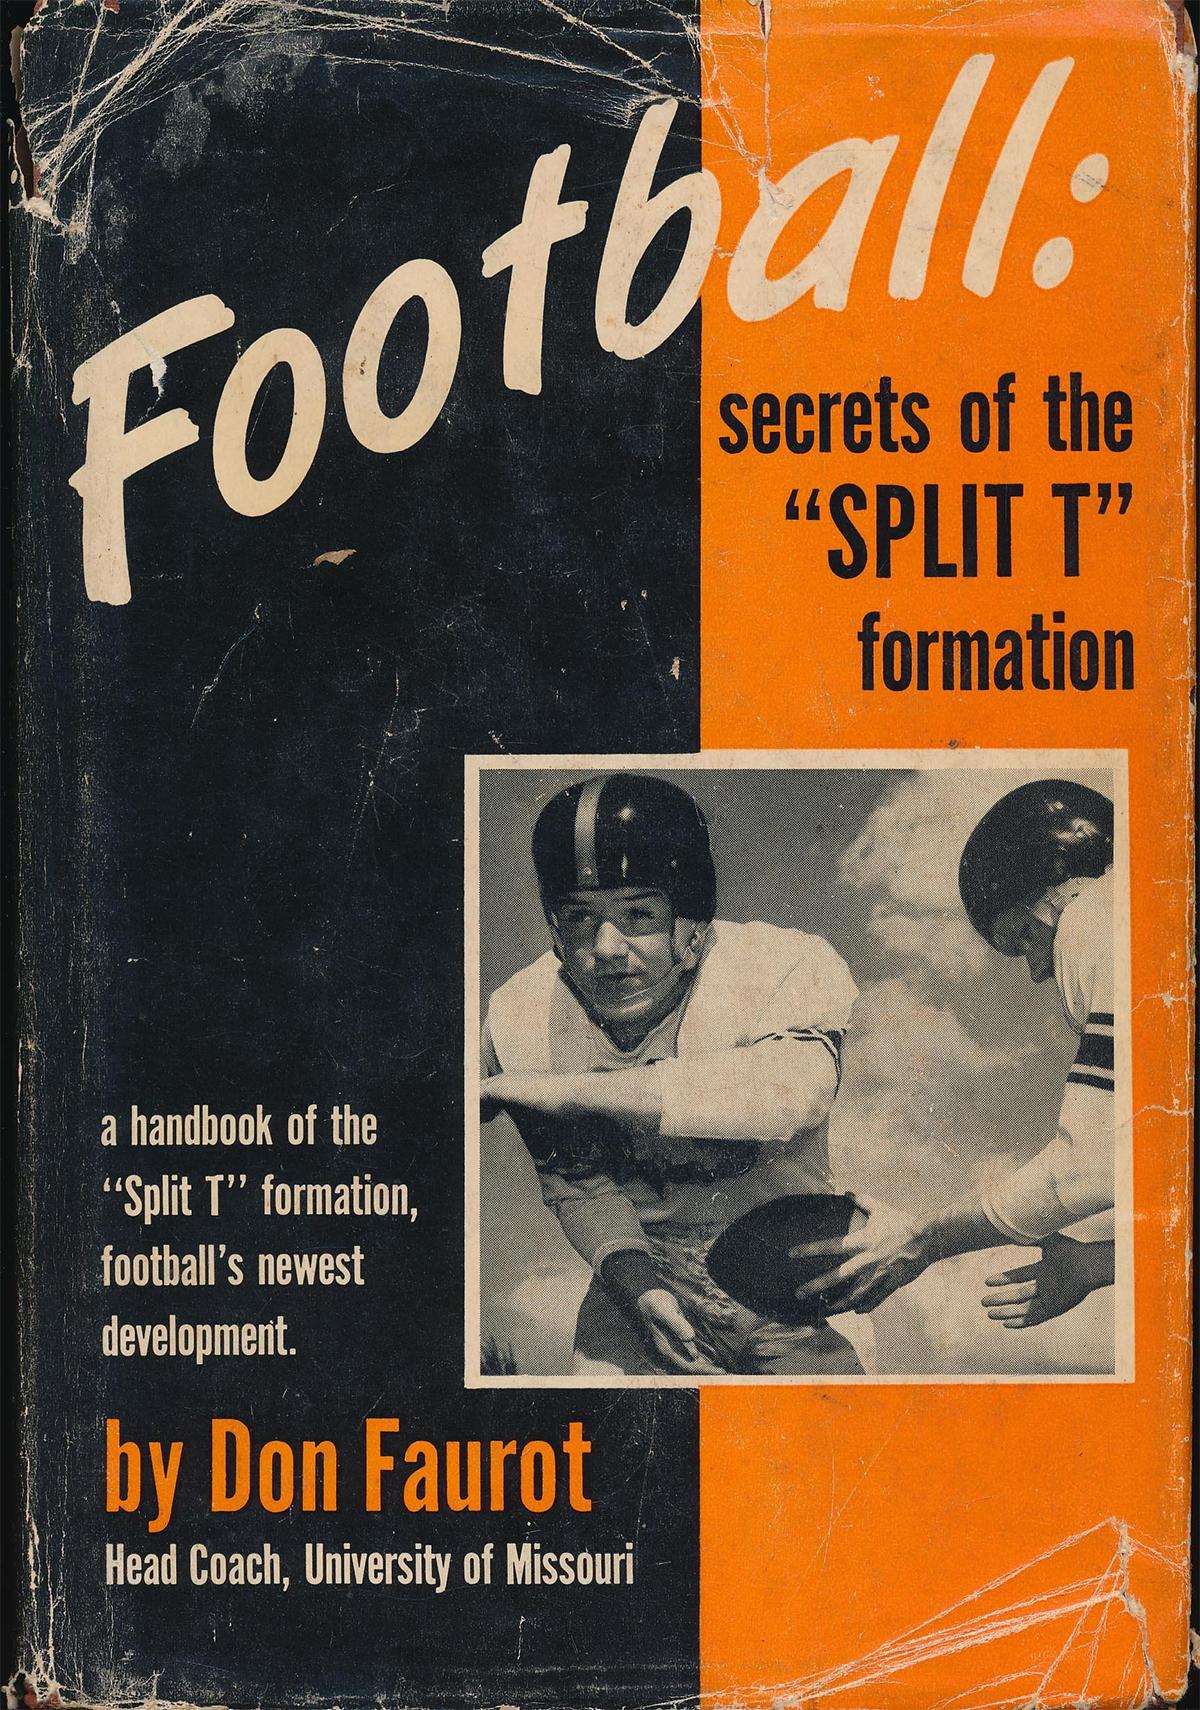 Don Faurot Book-Split T